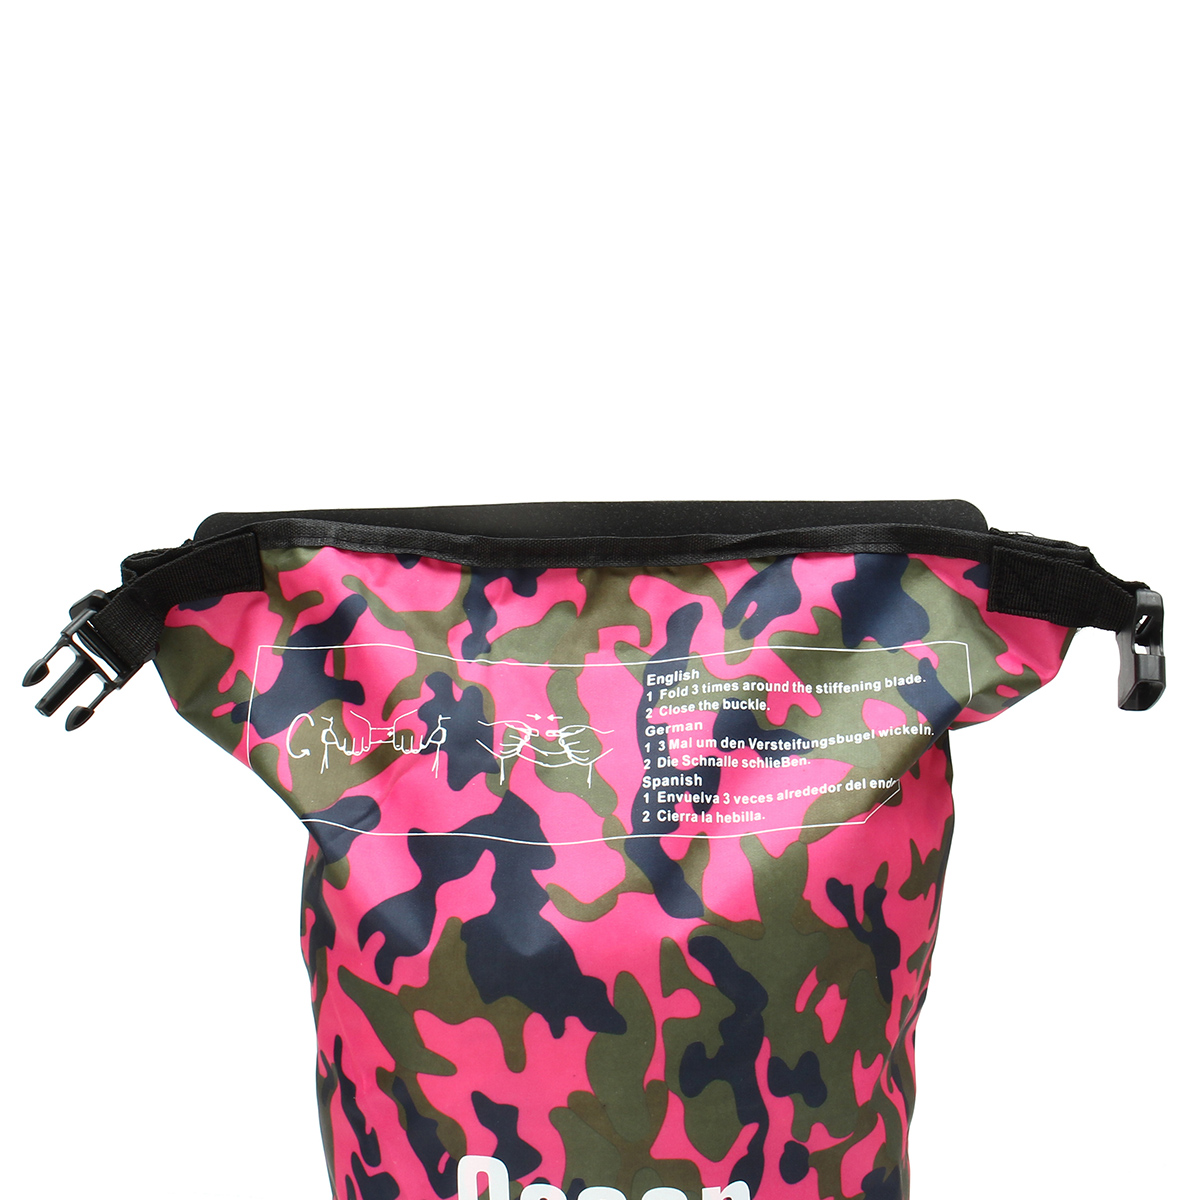 15L Waterproof Bag Camping Rafting Storage Dry Bag Swimming Bag Lightweight Diving Floating Bag